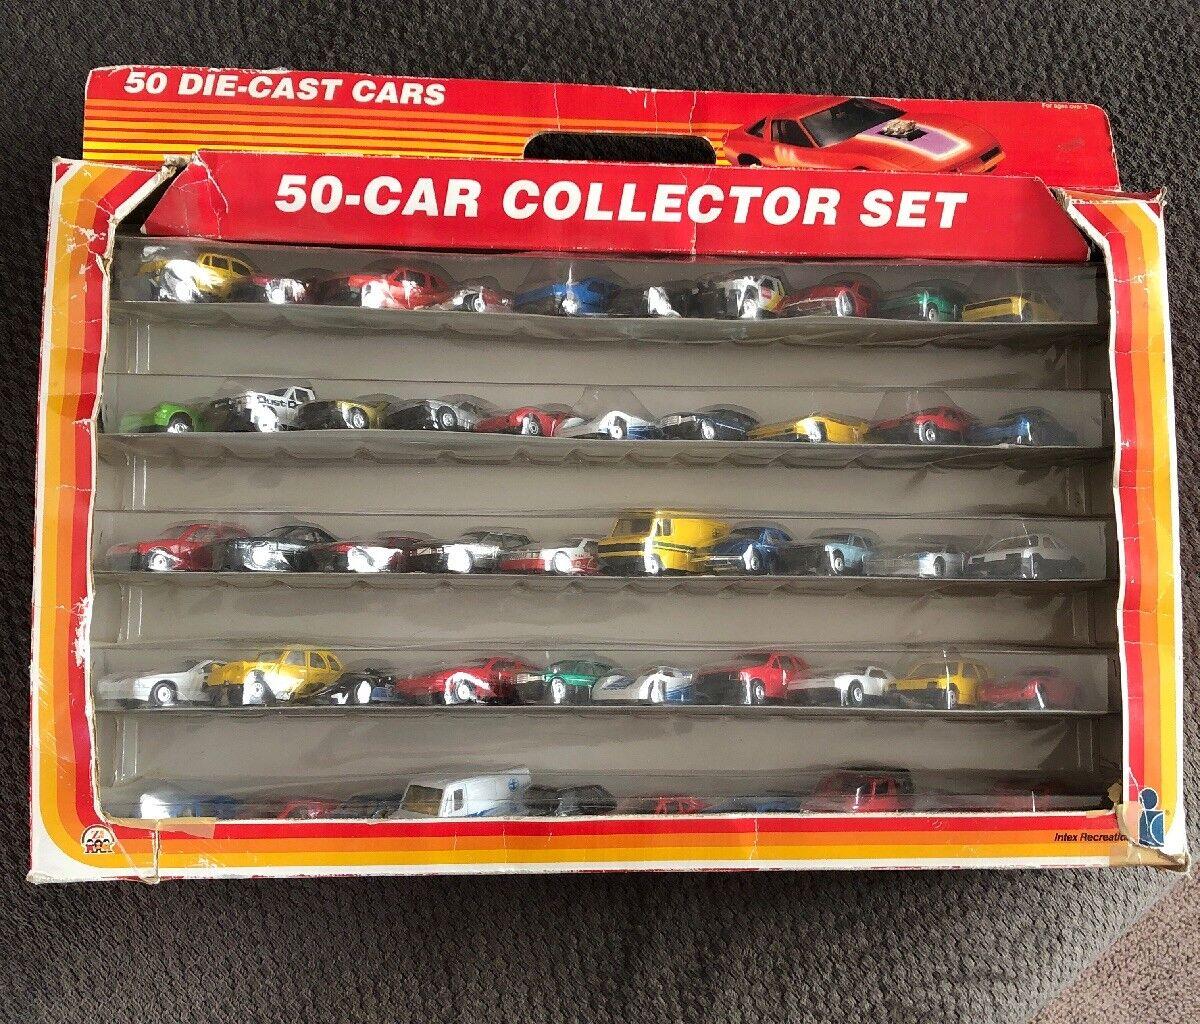 1989 INTEX RECREATION. 50 CAR COLLECTOR SET. Factory Sealed